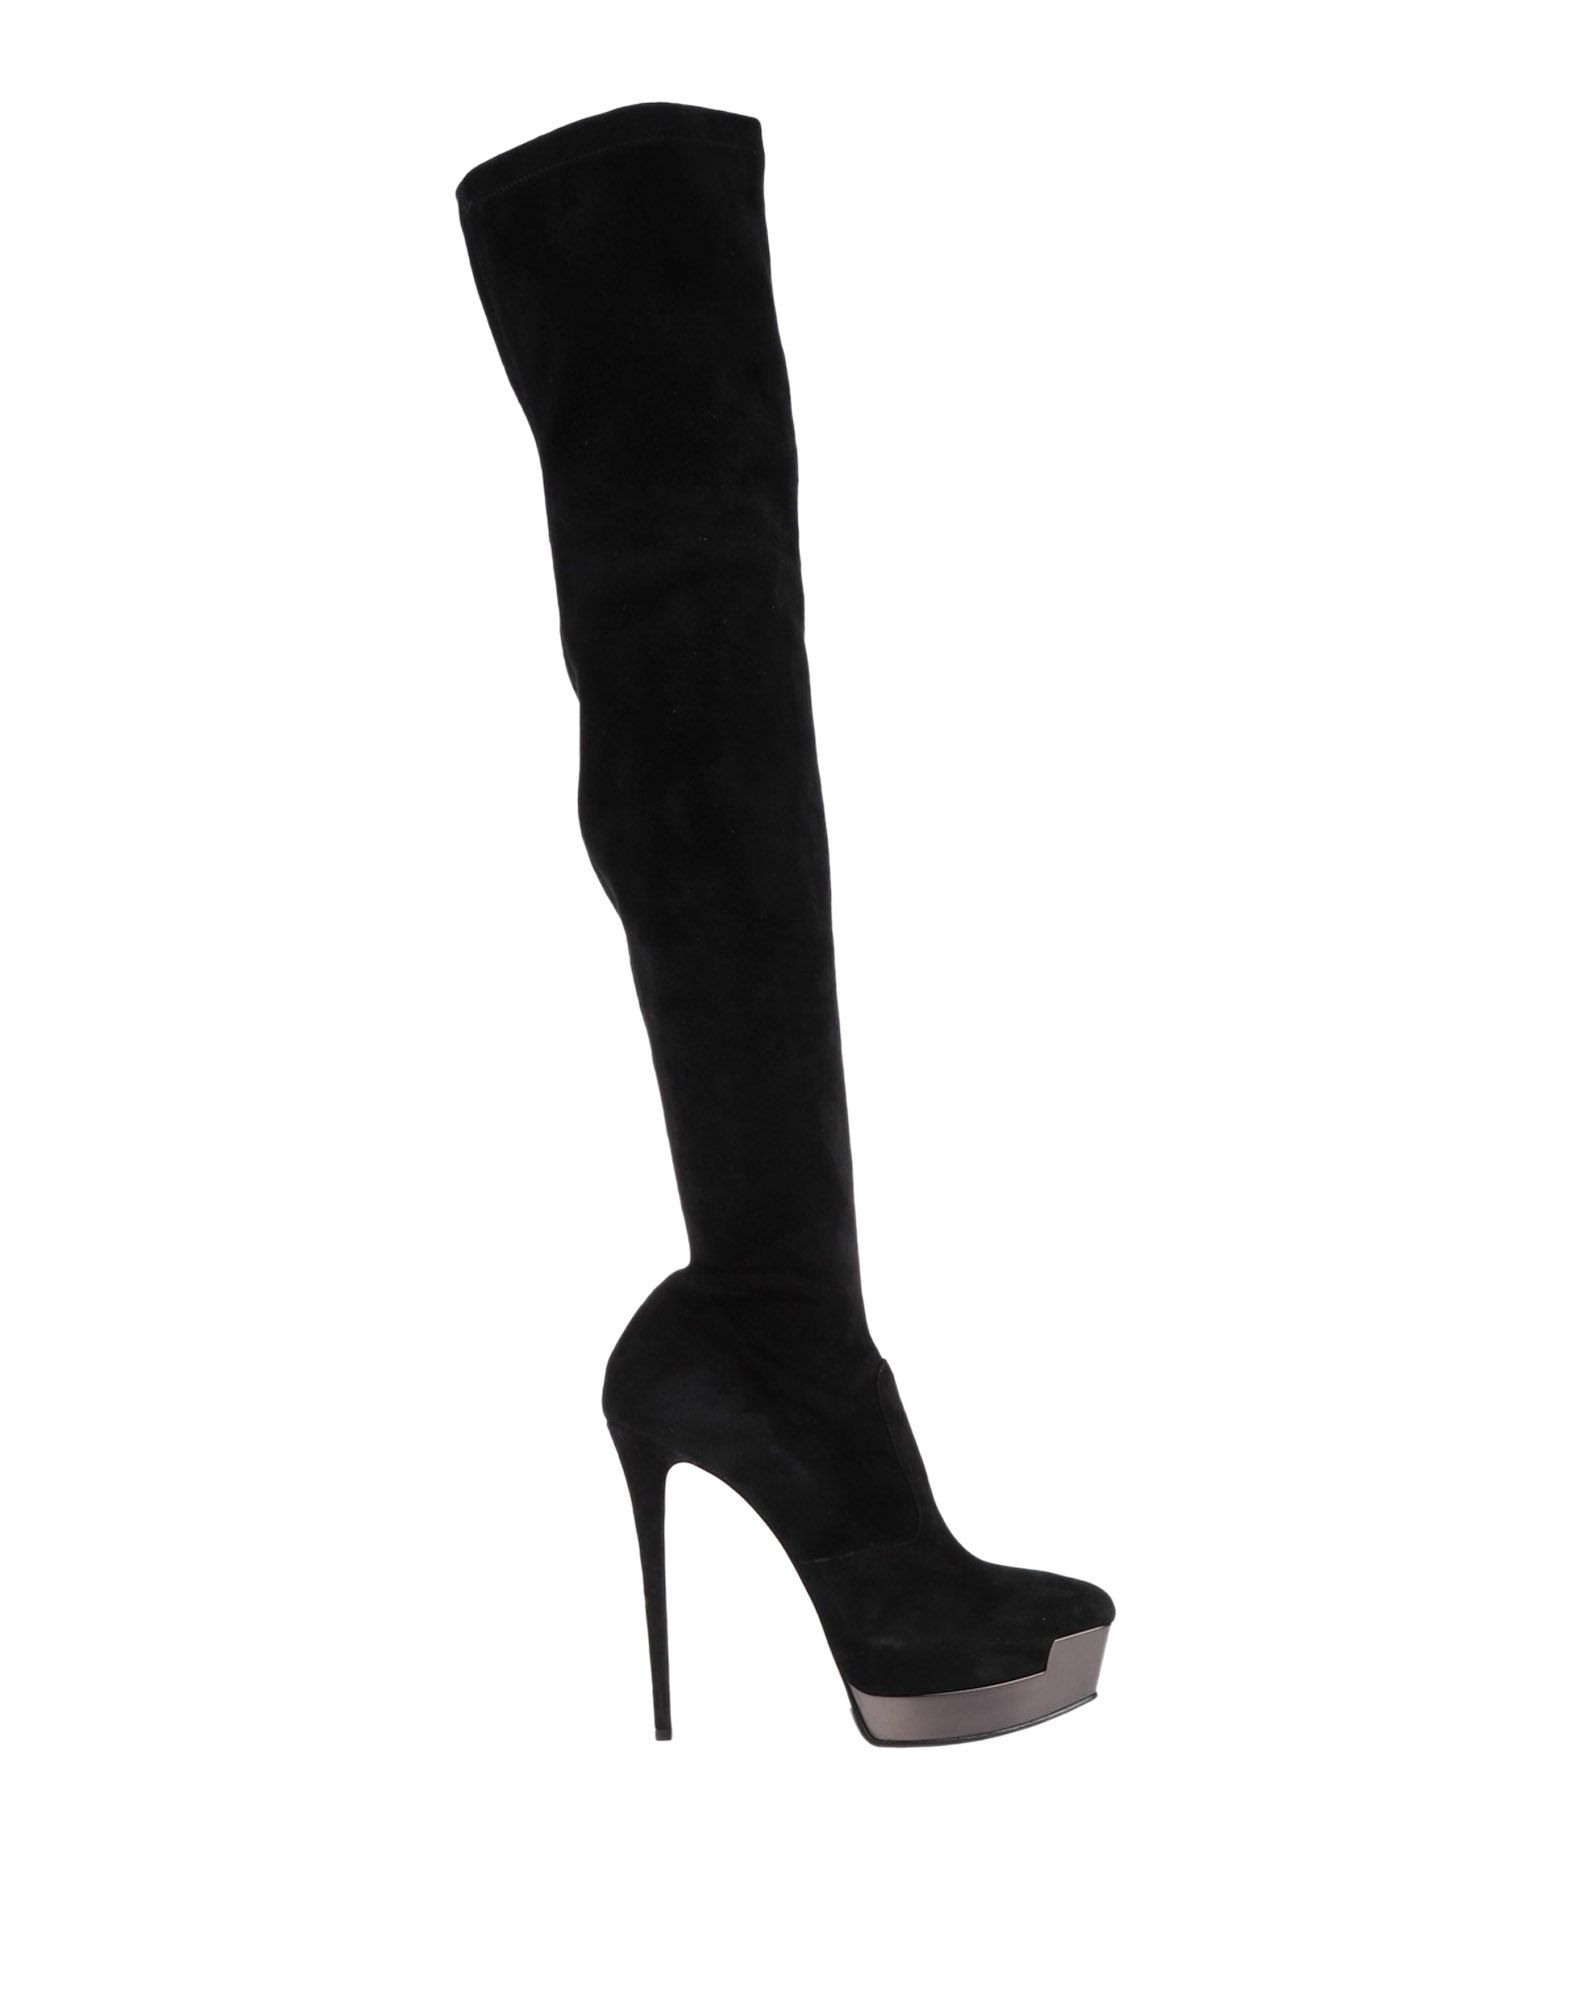 Le Silla Boots Boots - Women Le Silla Boots Boots online on  United Kingdom - 11527244CG d5e735